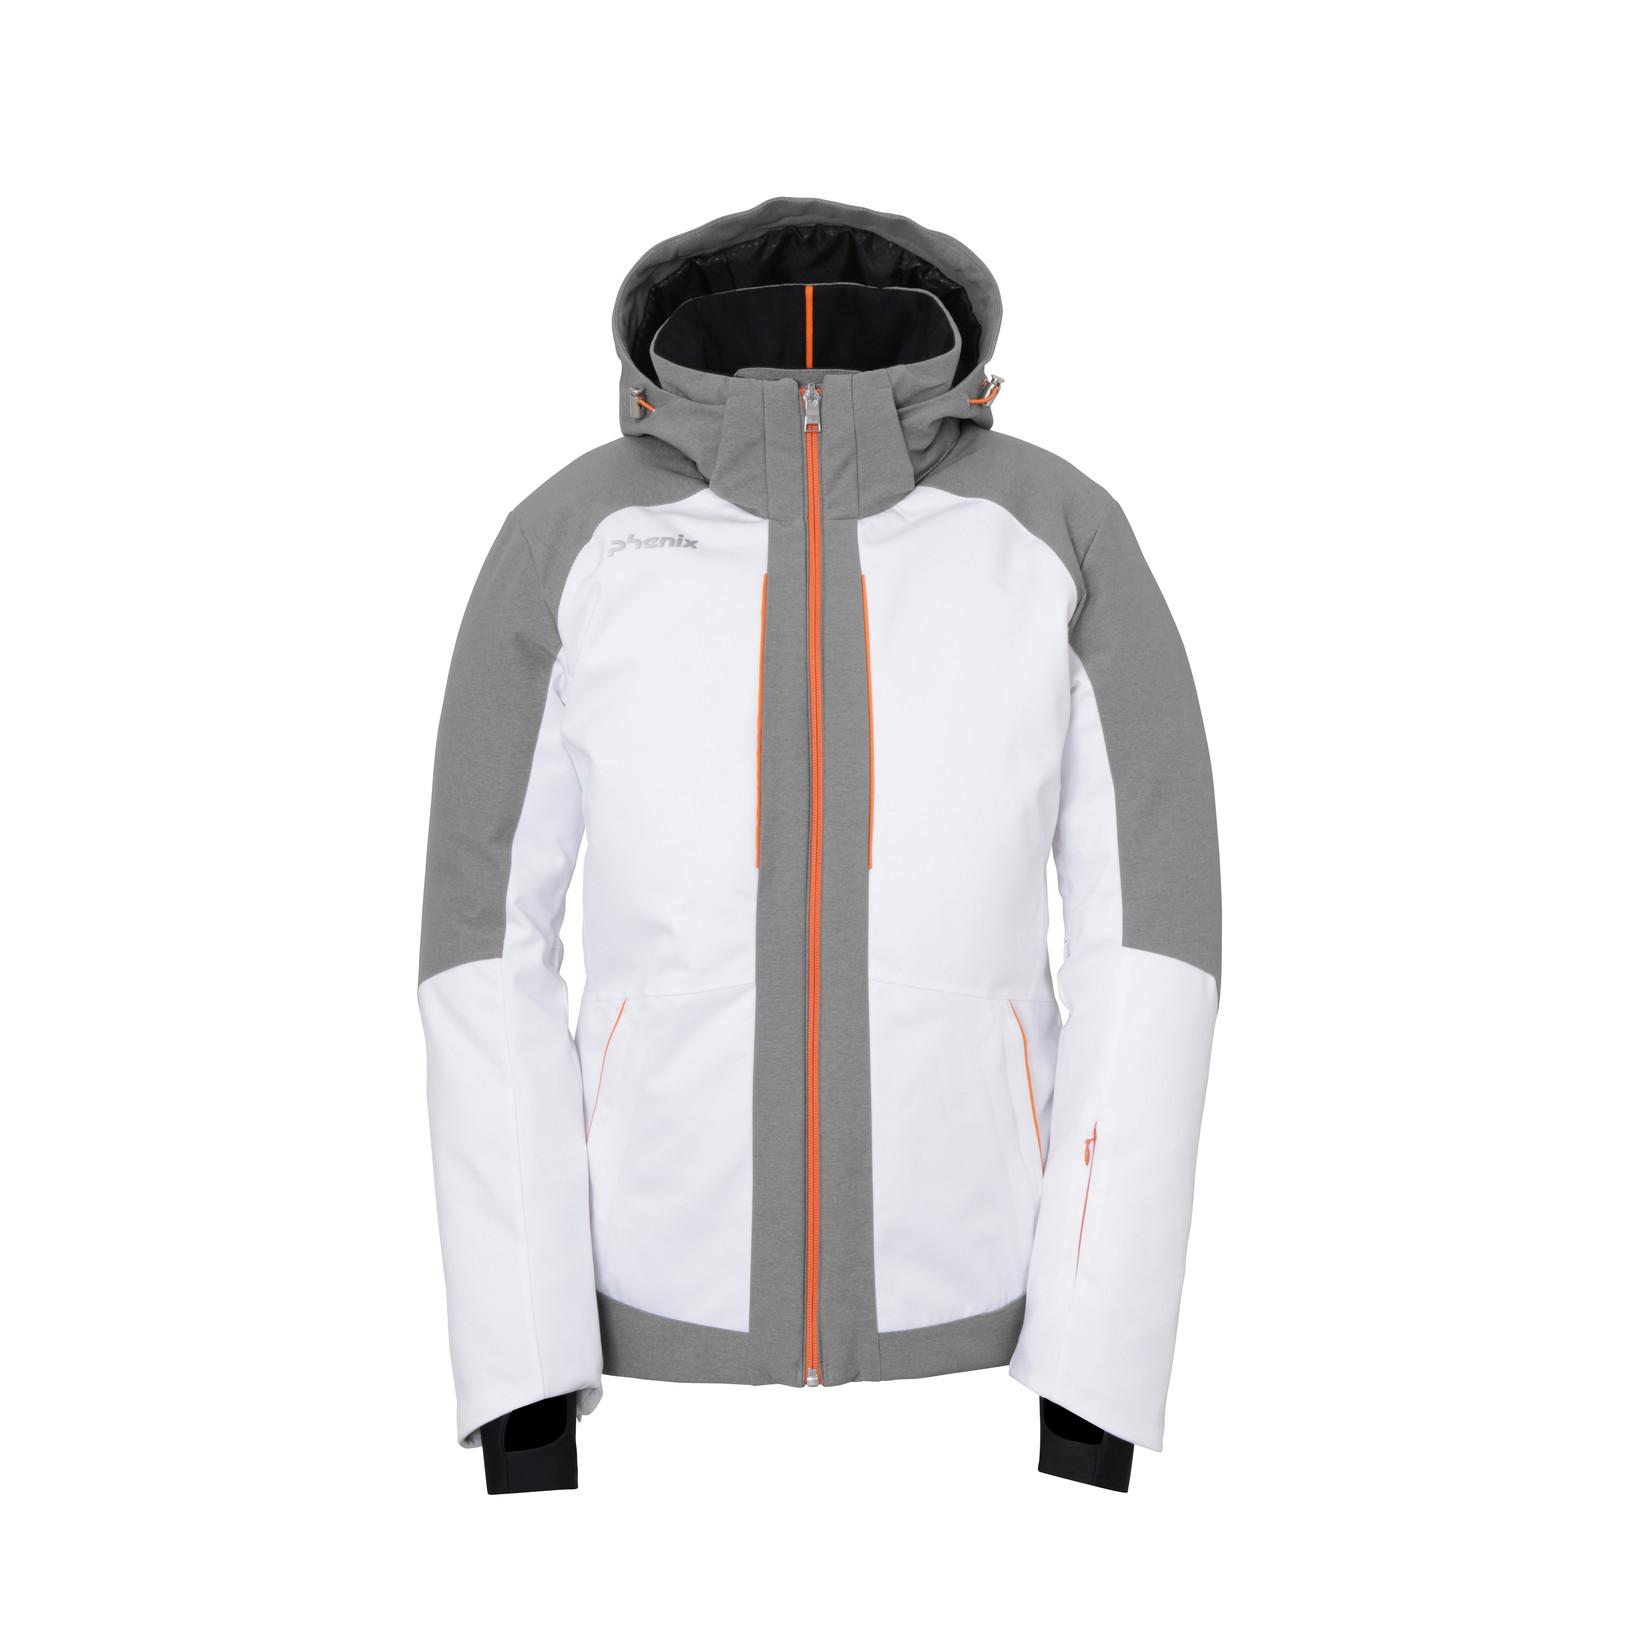 PHENIX Peony Jacket